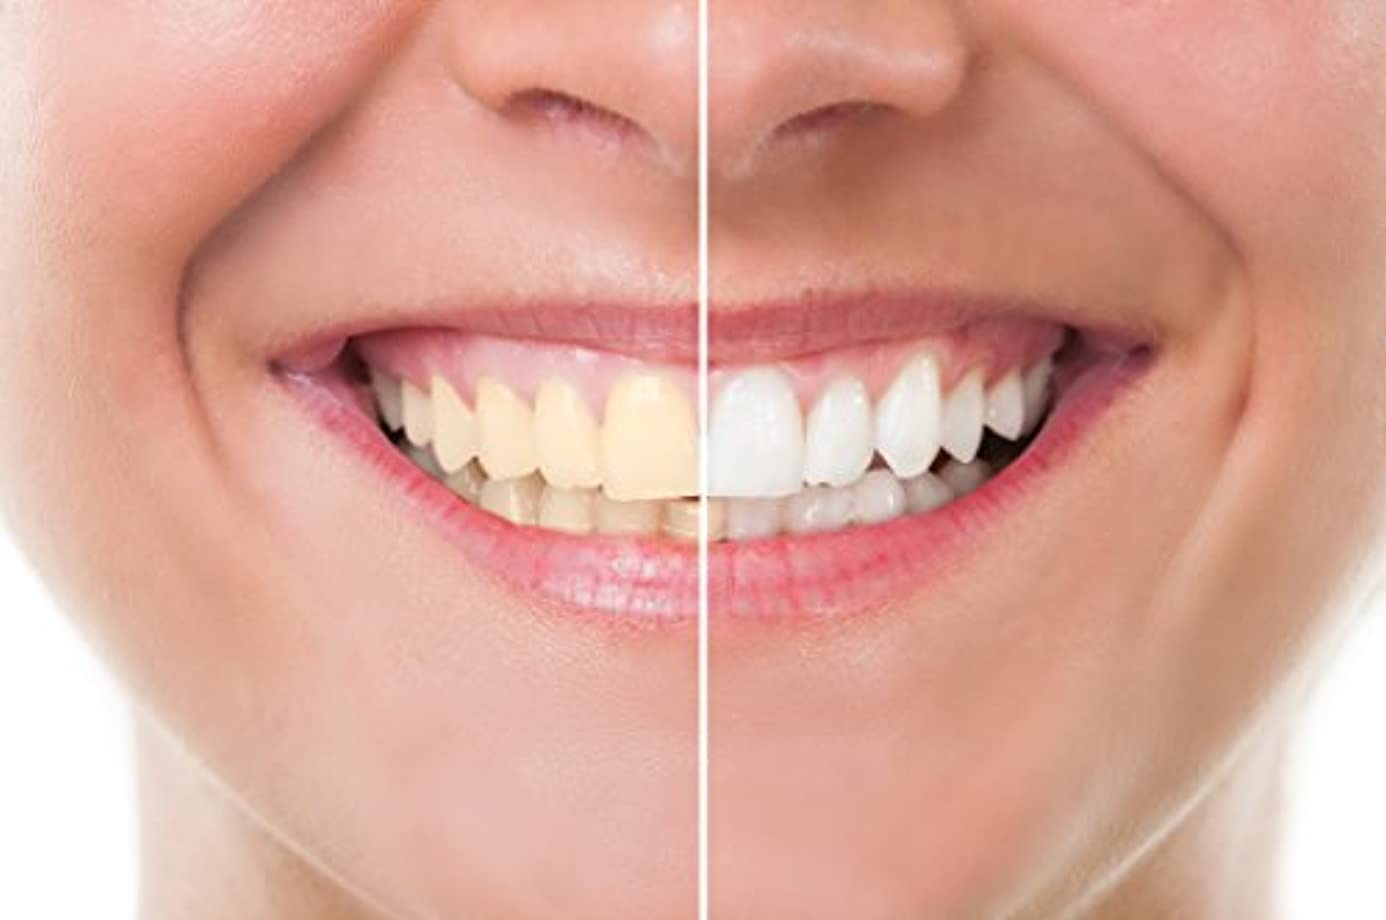 Teeth Whitening 歯のホワイトニング